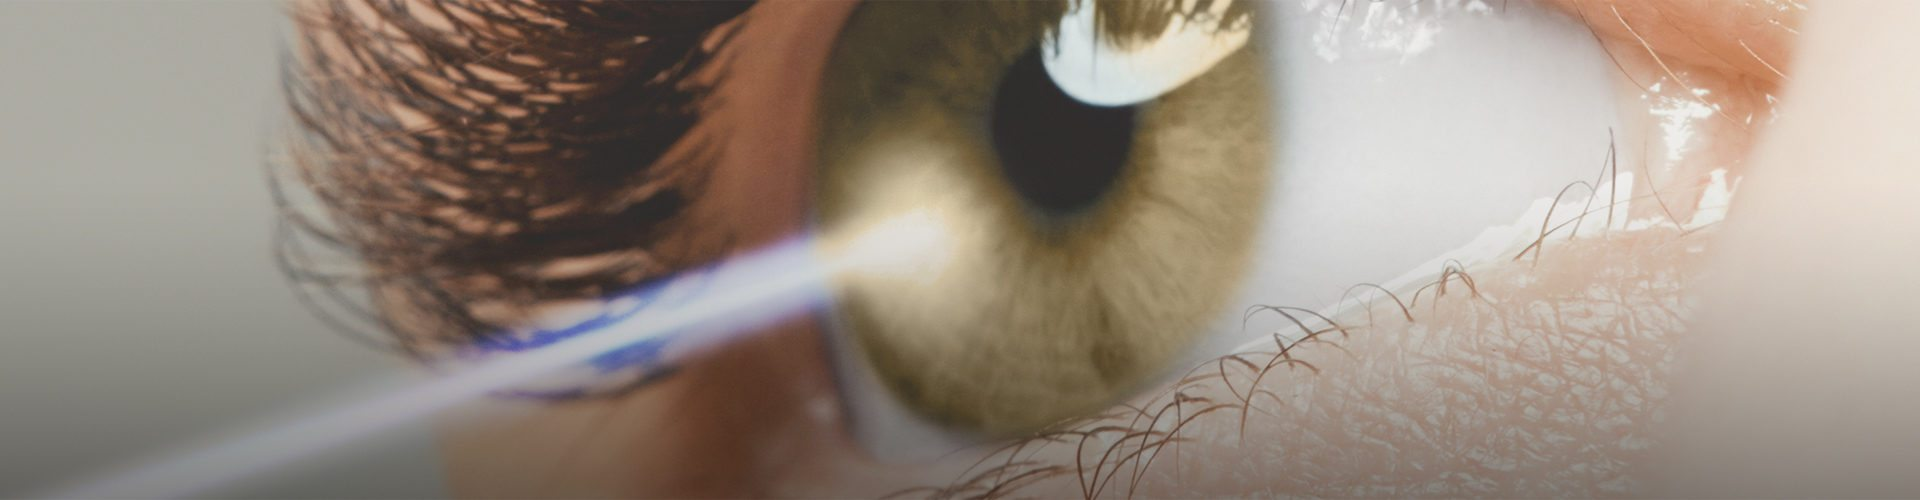 Laser Eye Surgery In Iran Laser Eye Surgery In Iran 6